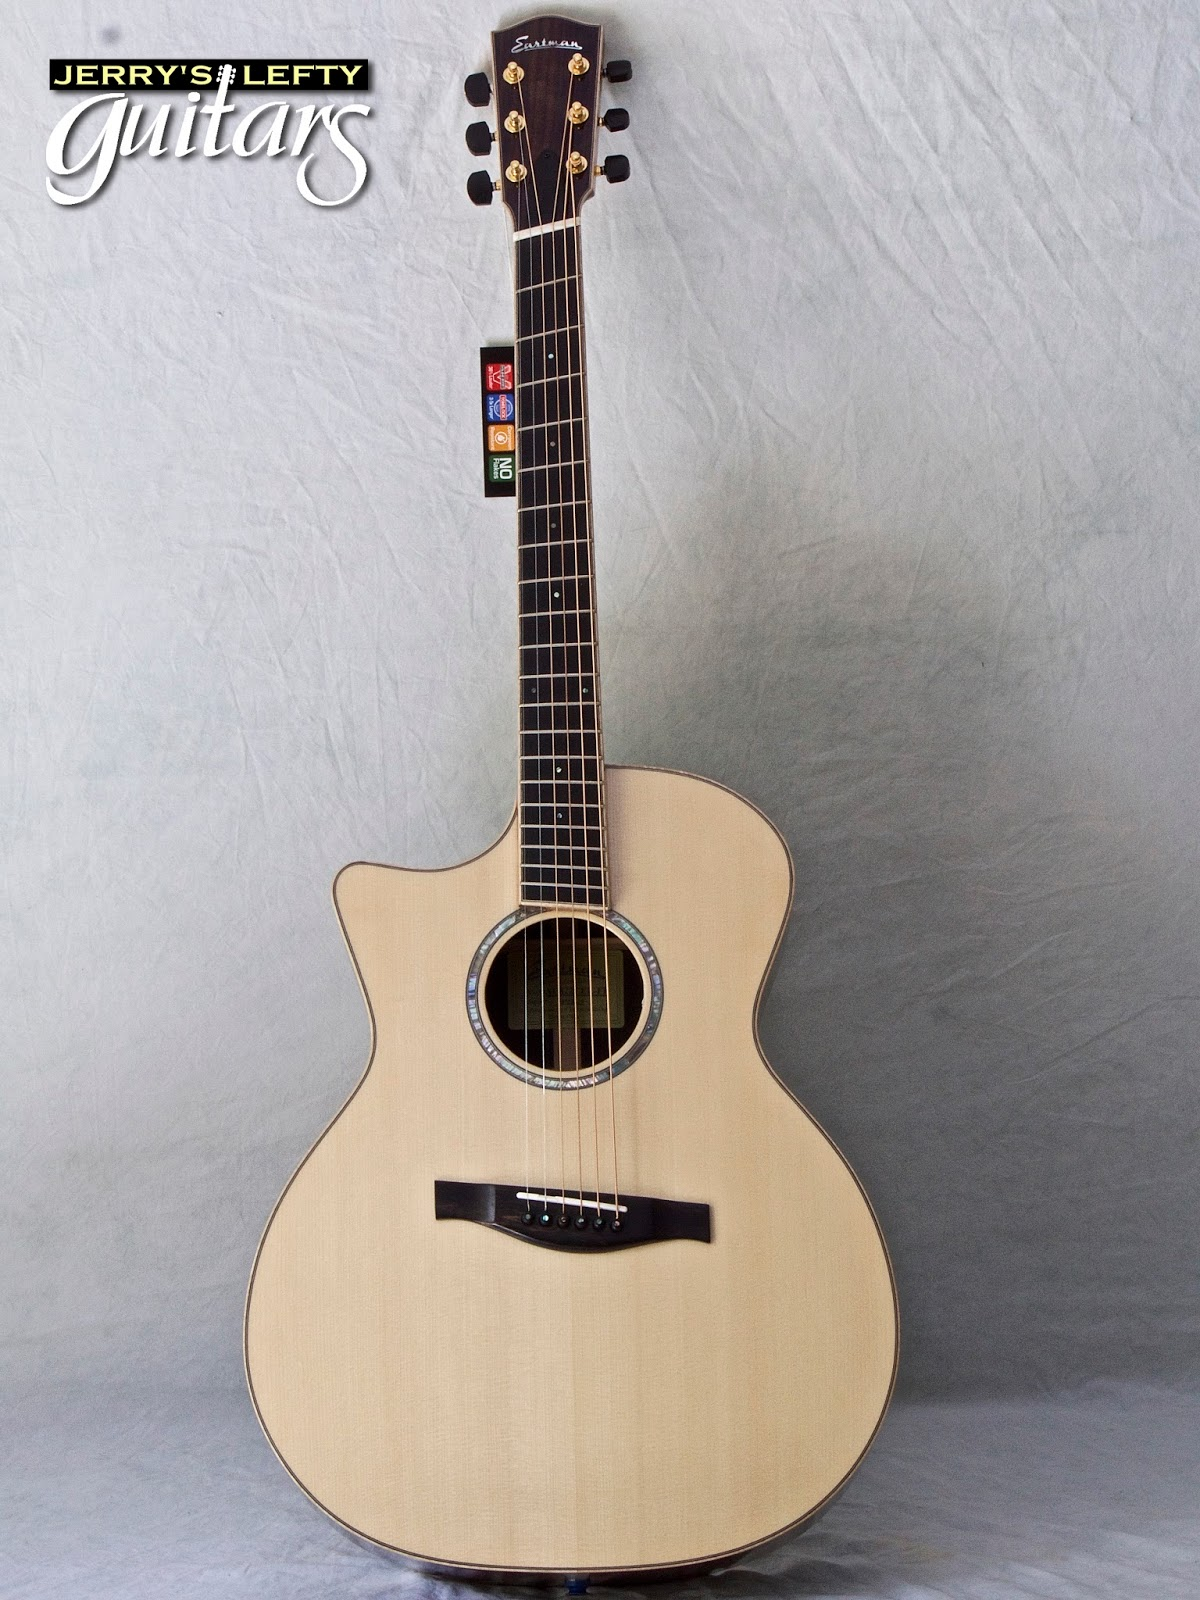 jerry 39 s lefty guitars newest guitar arrivals updated weekly eastman ac822ce ff fan fret left. Black Bedroom Furniture Sets. Home Design Ideas